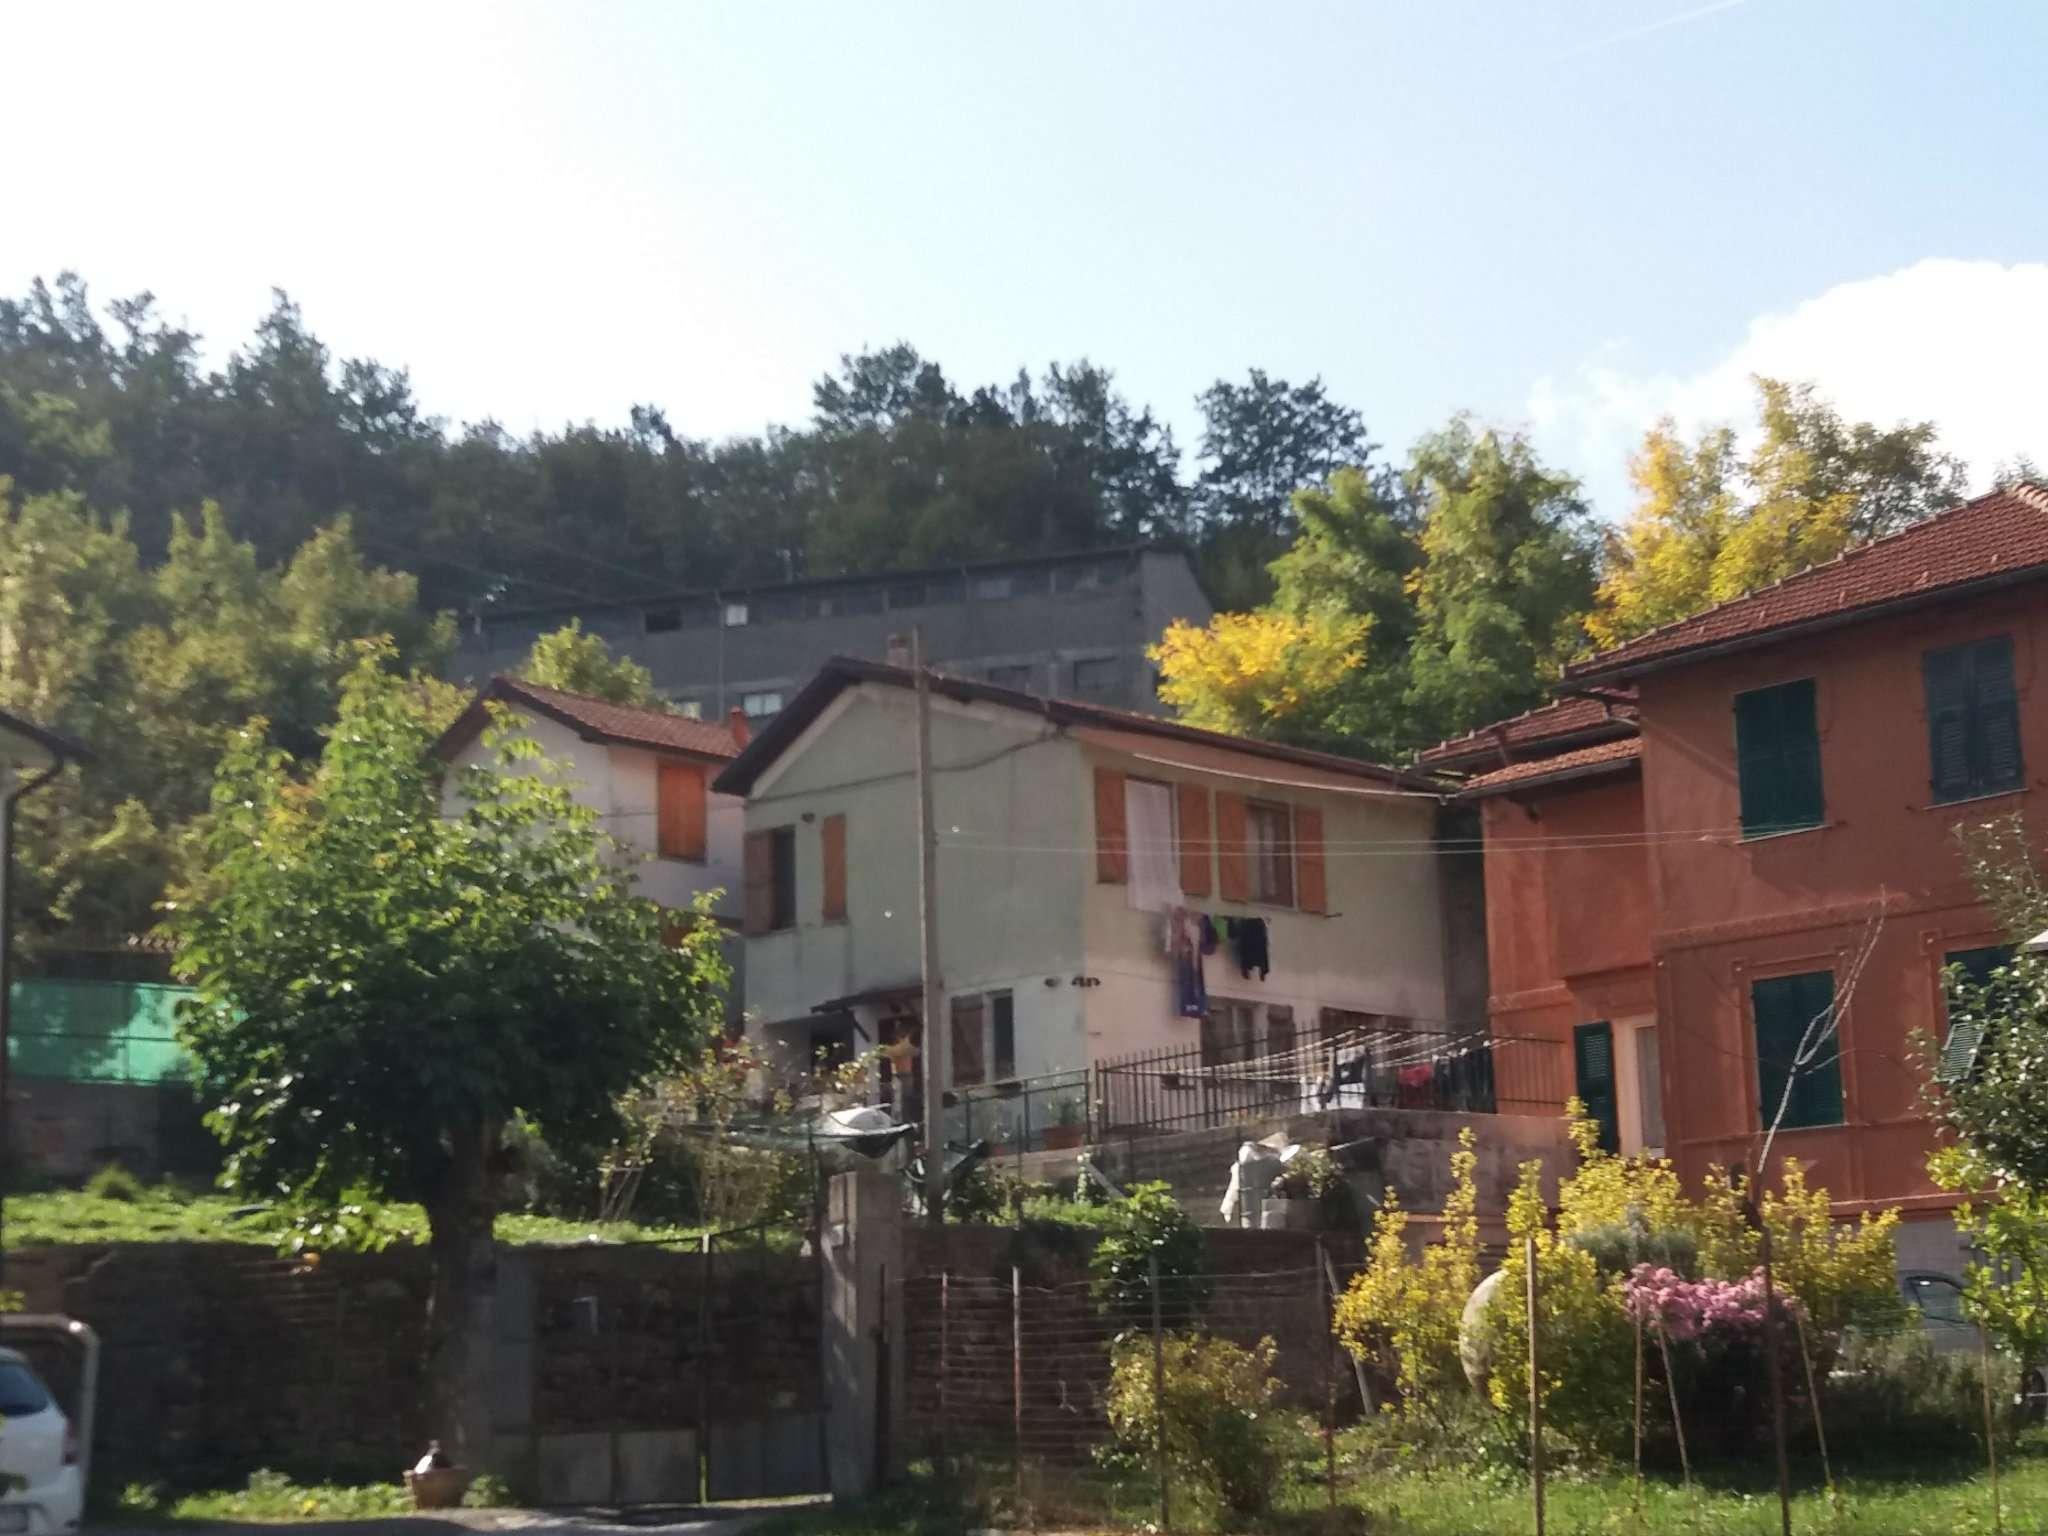 Casa indipendente in Vendita a Casella Periferia: 5 locali, 140 mq